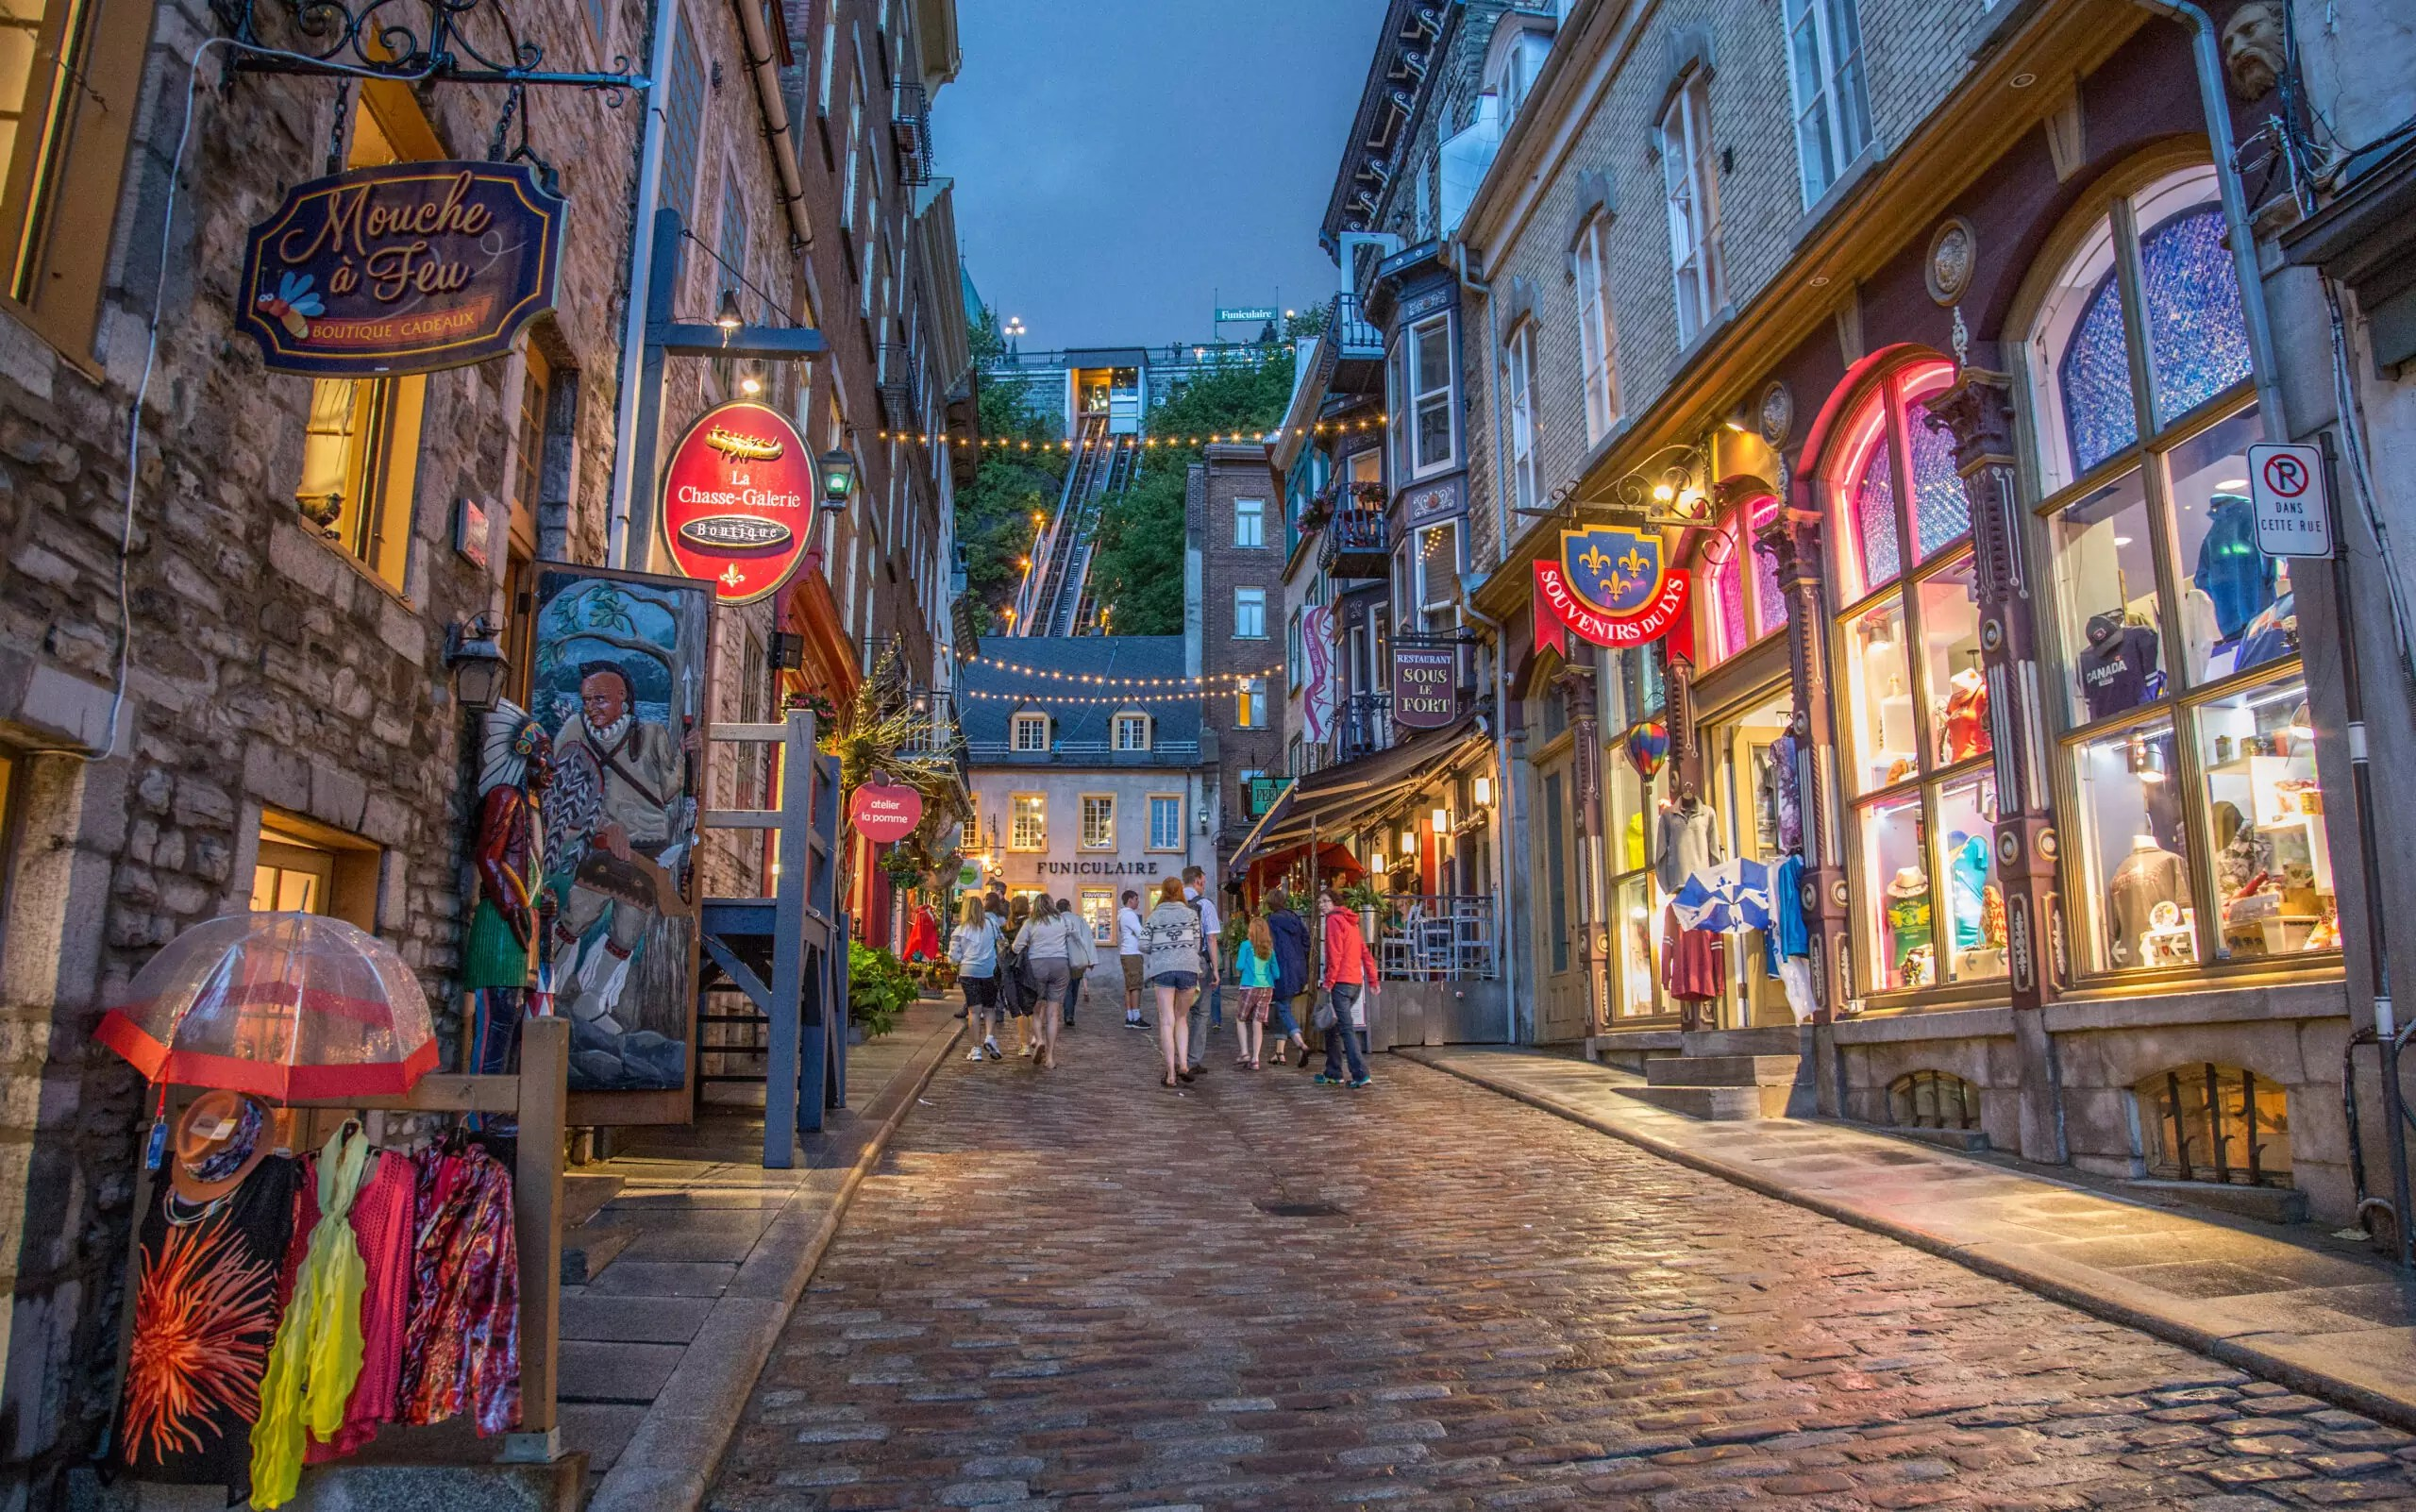 Rue Street, Quebec City